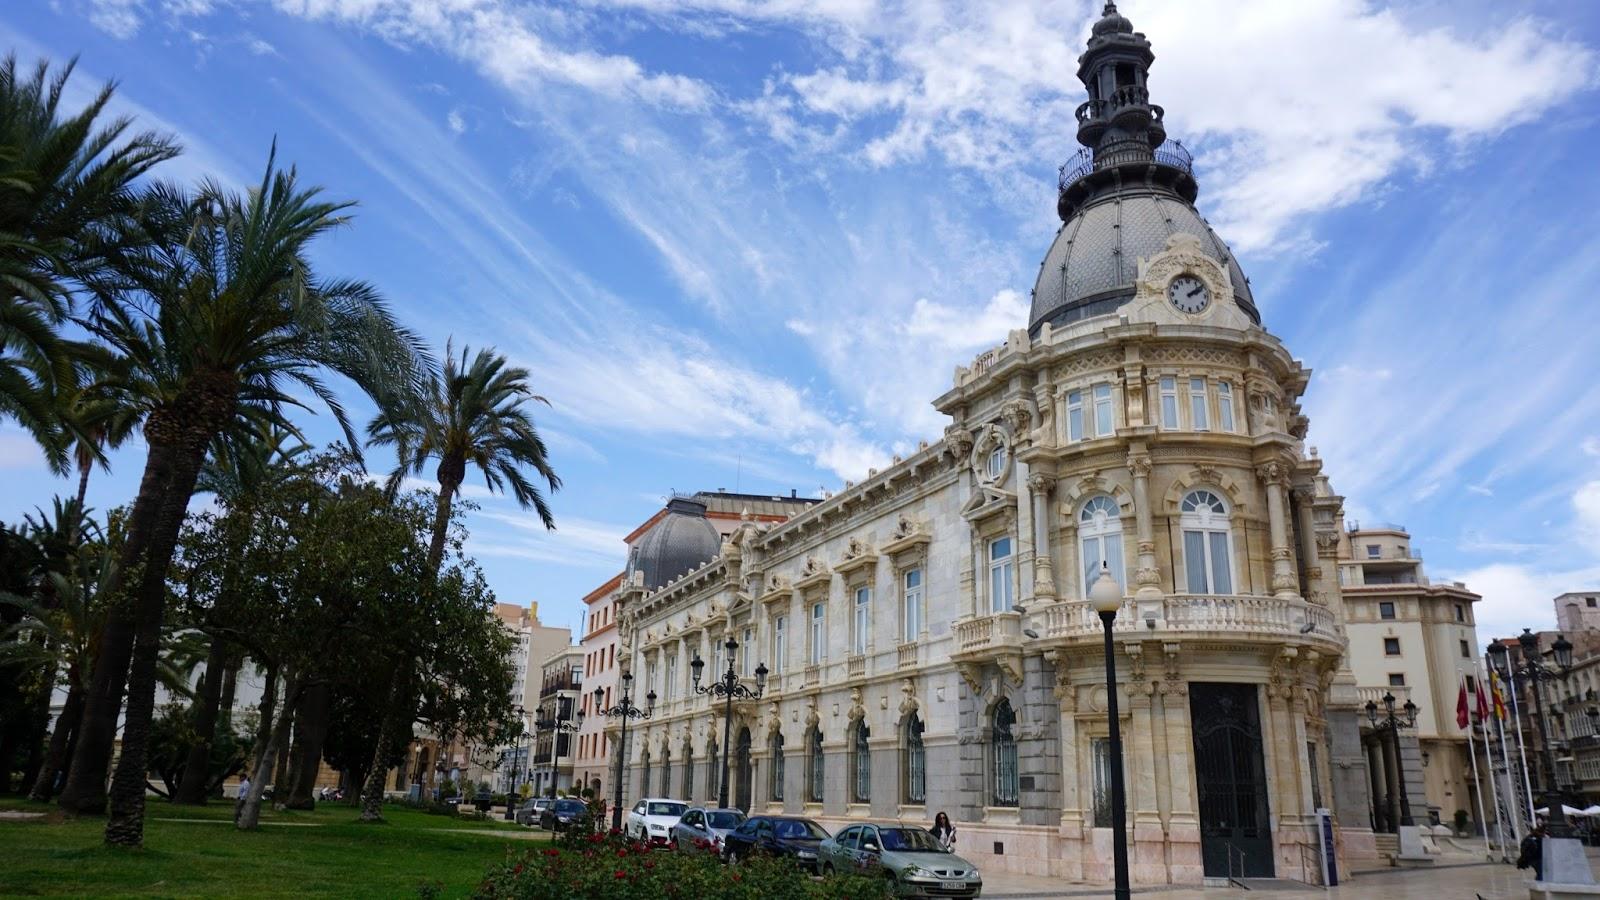 ratusz miejski Kartagena, Palacio Consistorial, Hiszpania, Południowa Hiszpania miasta, prowincja Murcja,  Costa Calida